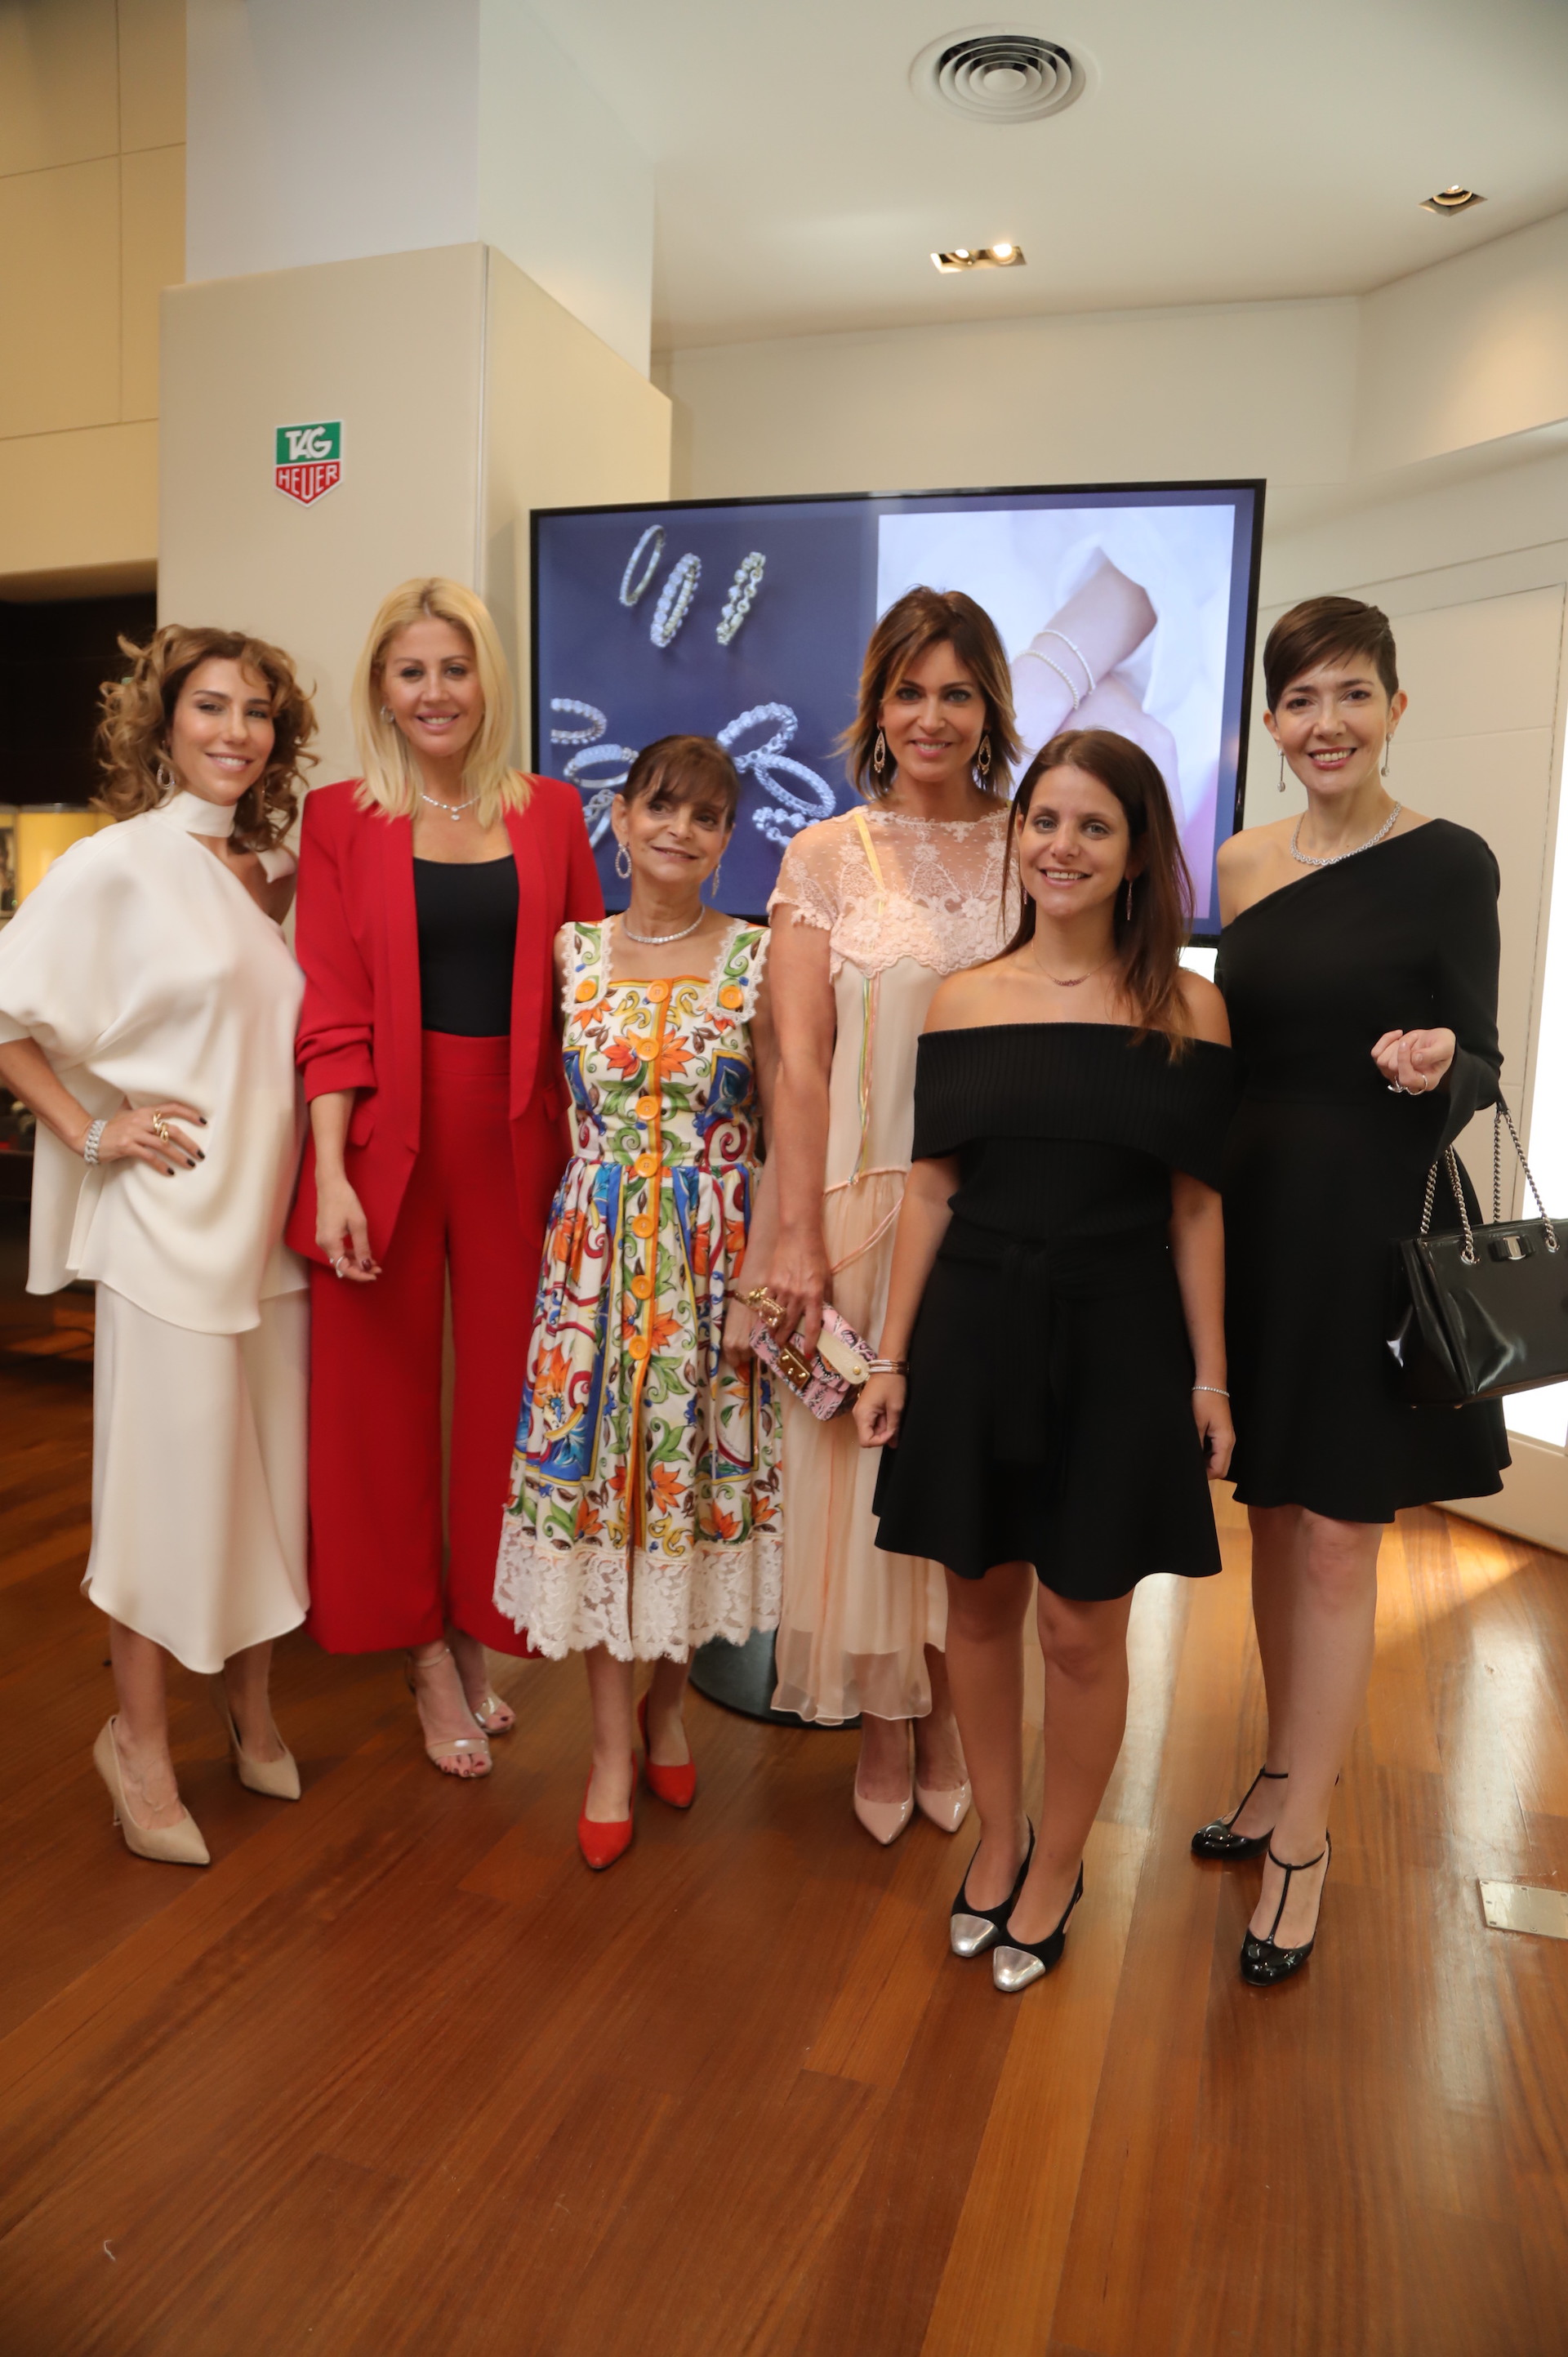 Julieta Novarro, Barbie Simons, Claudia Stad, Karina Mazzocco, Florencia Boskis Stad y Cristina Pérez